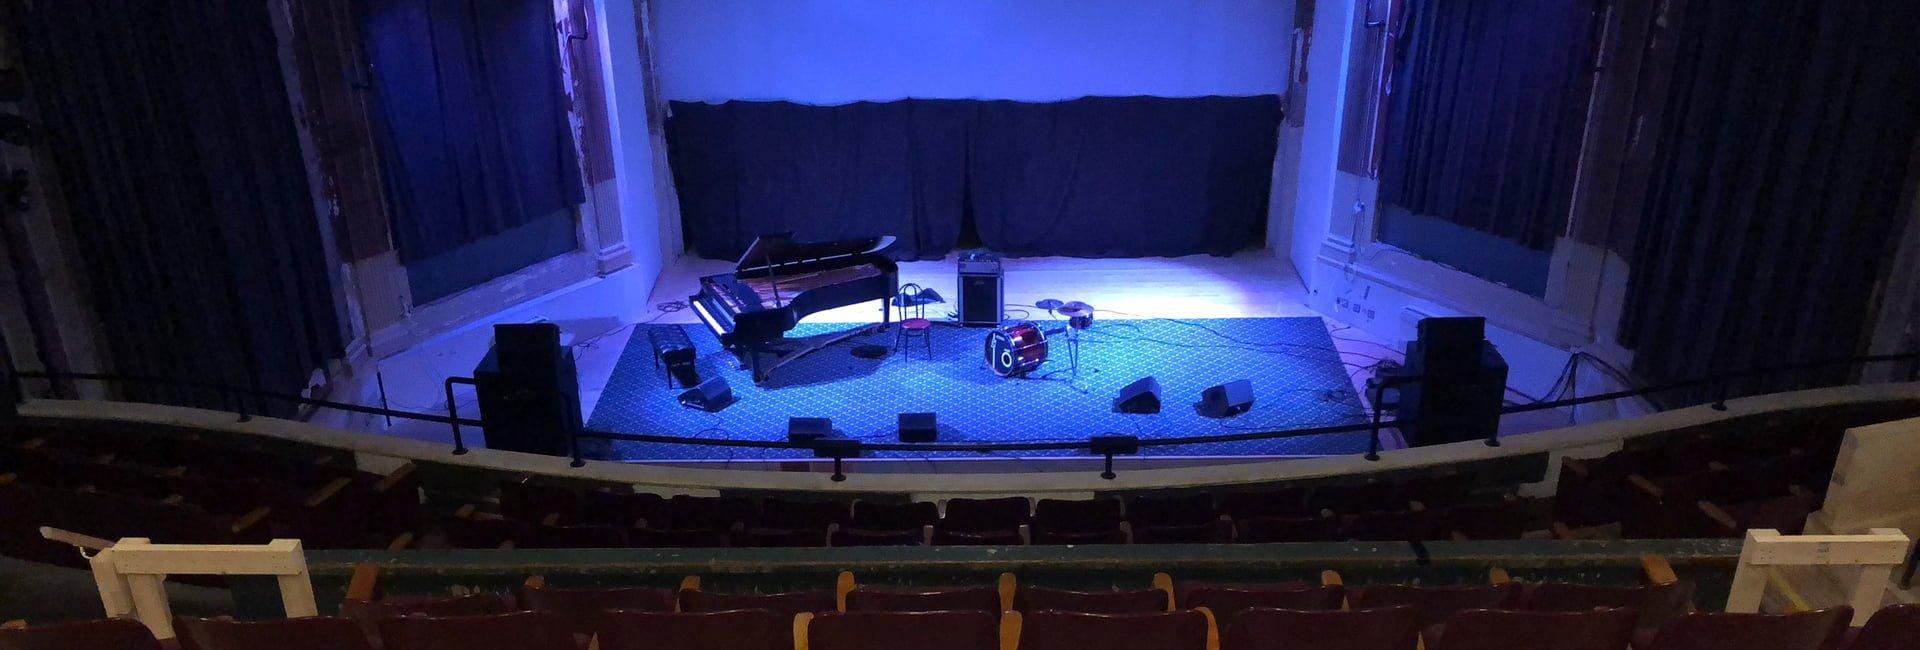 Strand Theatre, View from the balcony_Capital-Saratoga Region